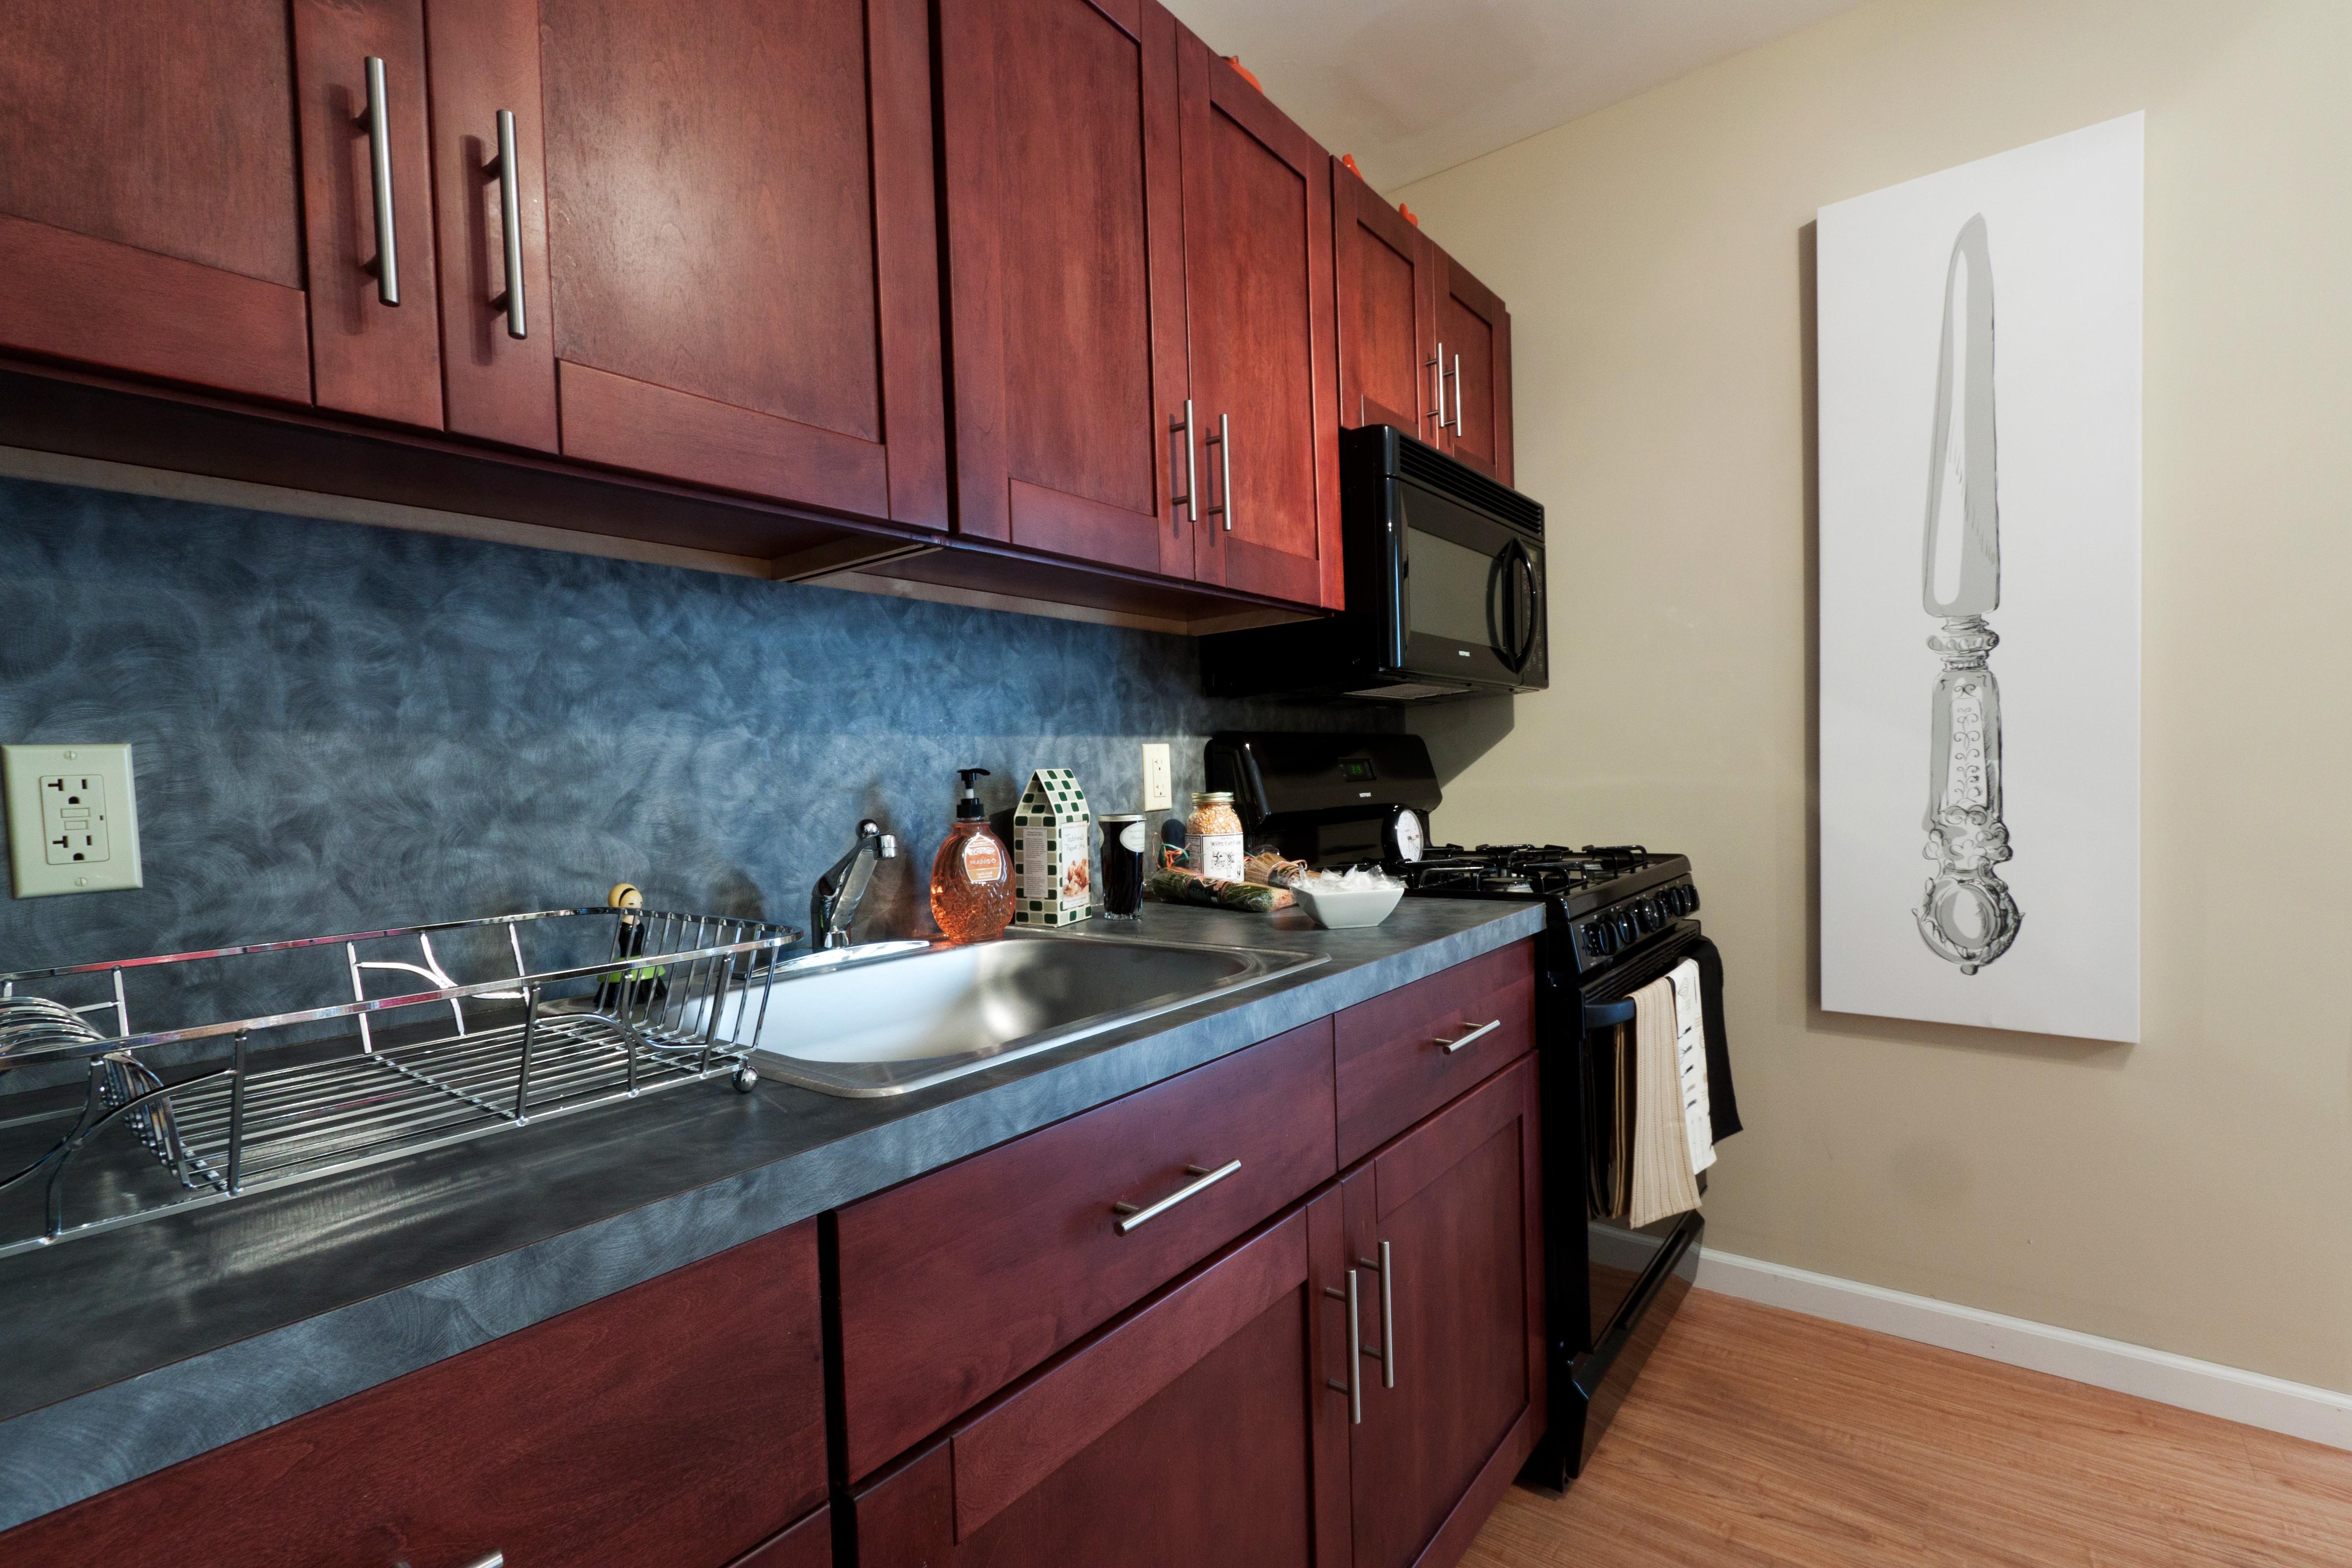 Apartments Near Binghamton Campus Square (PRICE IS PER BEDROOM) for Binghamton University Students in Binghamton, NY